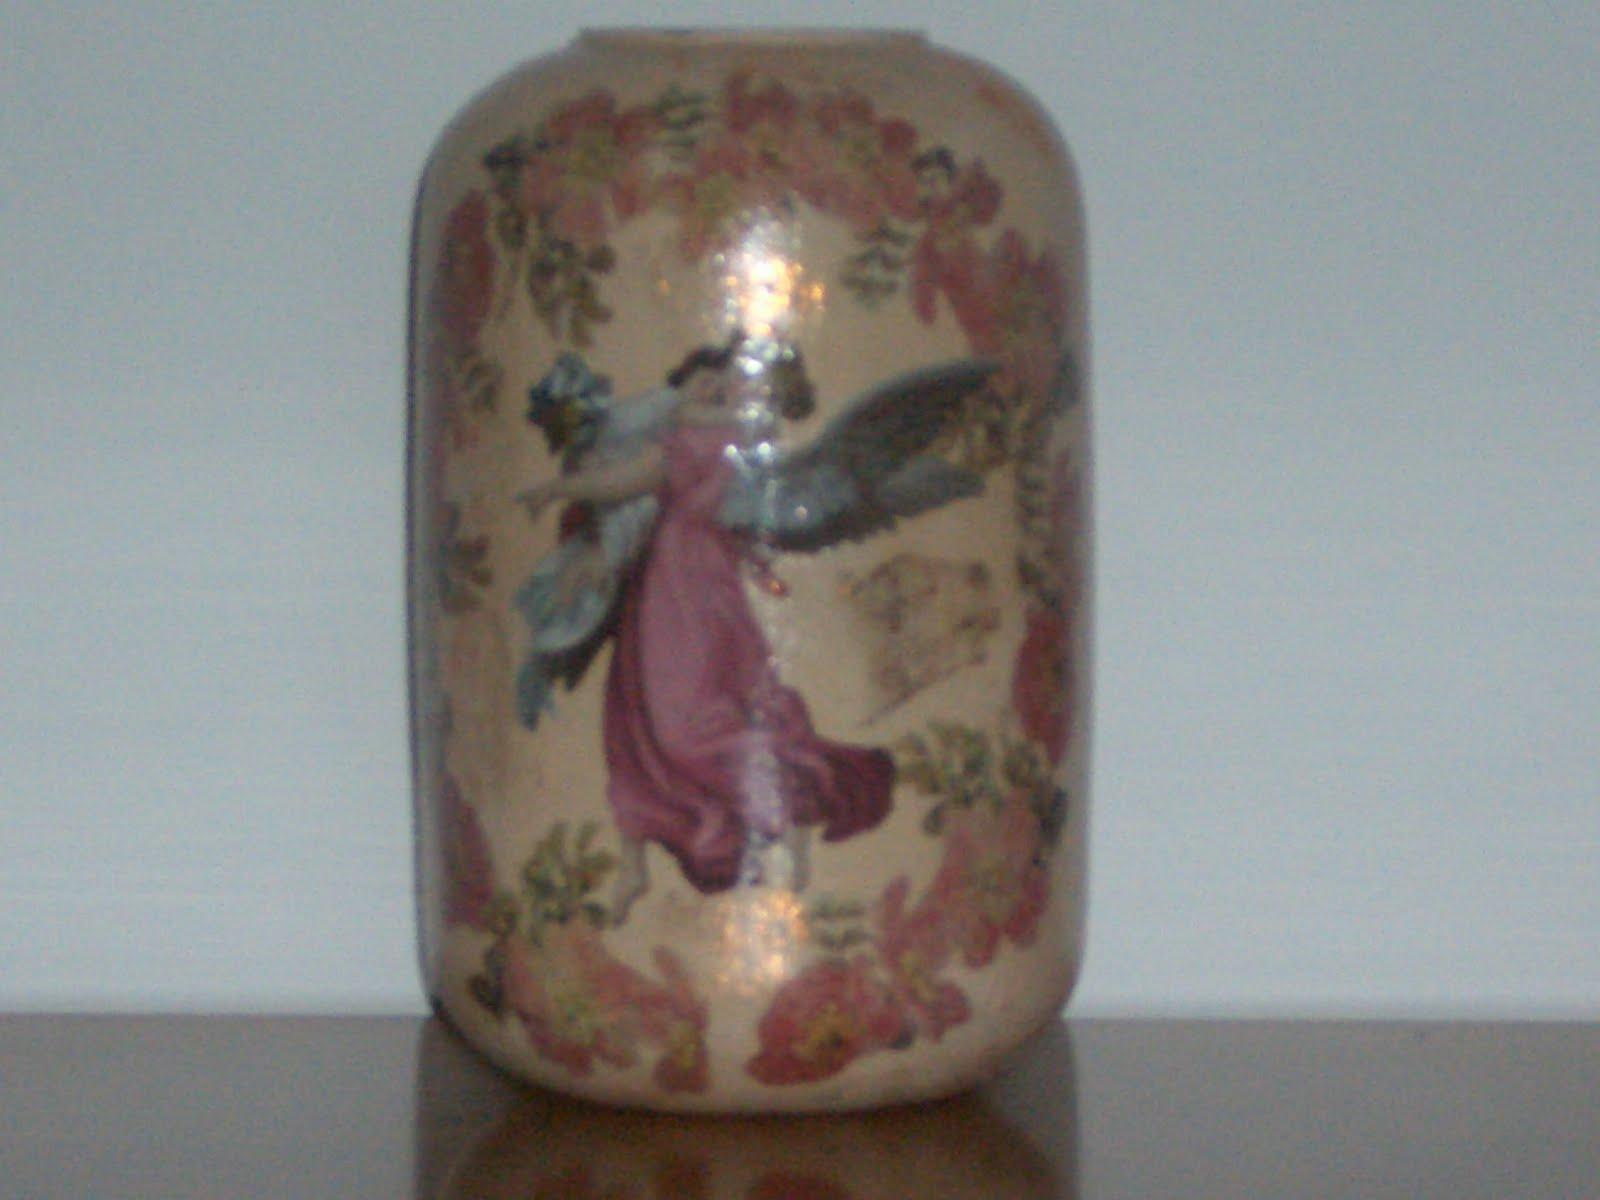 Alicehobby decoupage vaso anticato for Decoupage su vaso di vetro